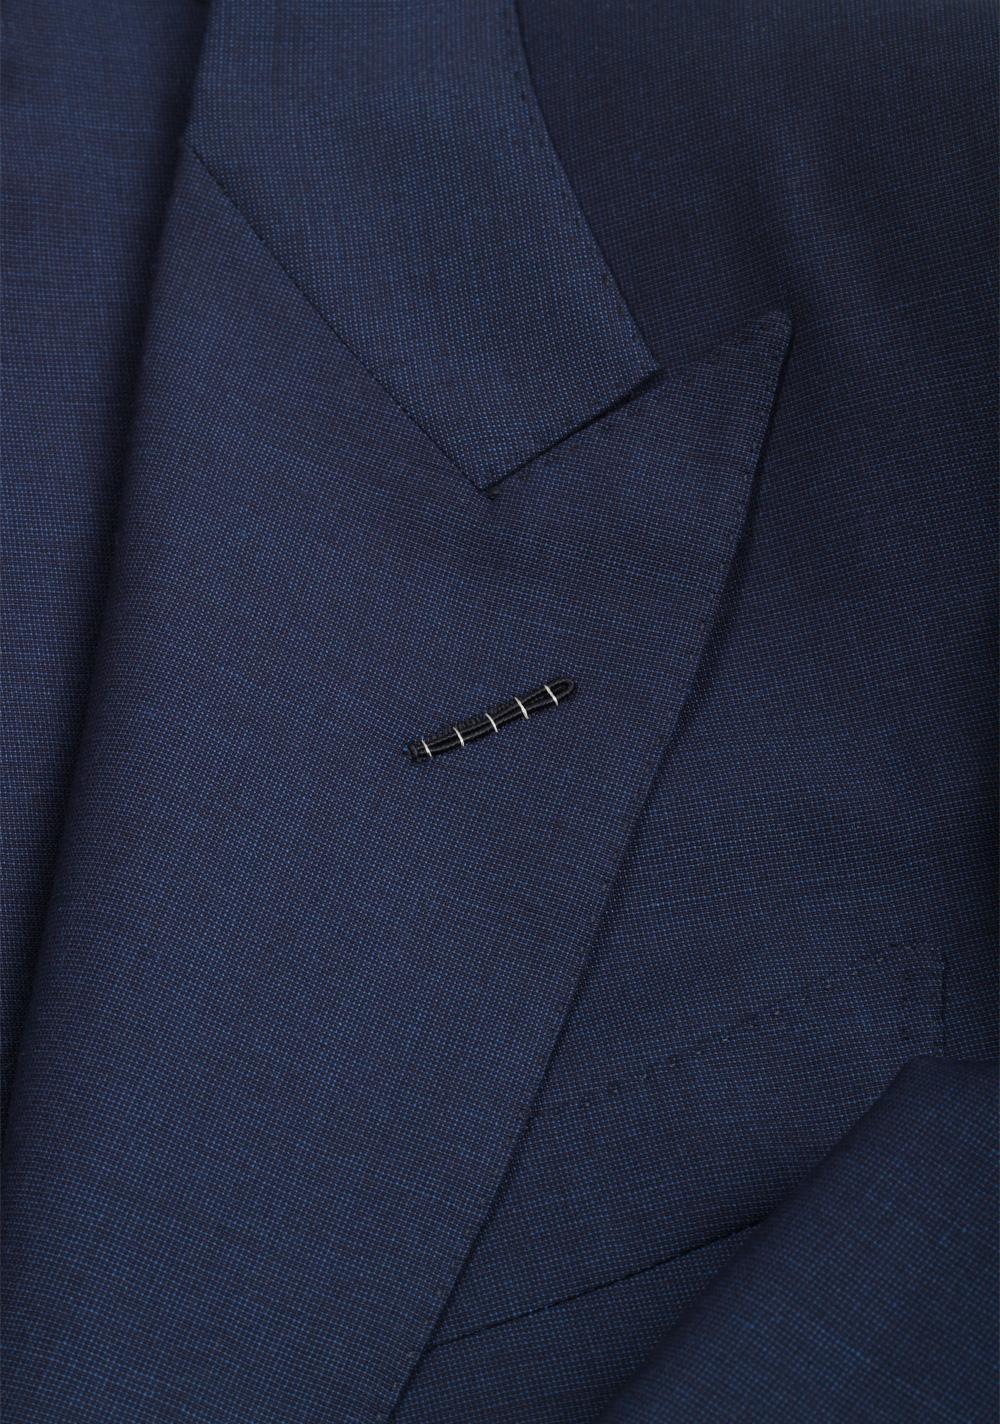 TOM FORD Windsor Blue 3 Piece Suit Size 48 / 38R U.S. Wool Fit A | Costume Limité